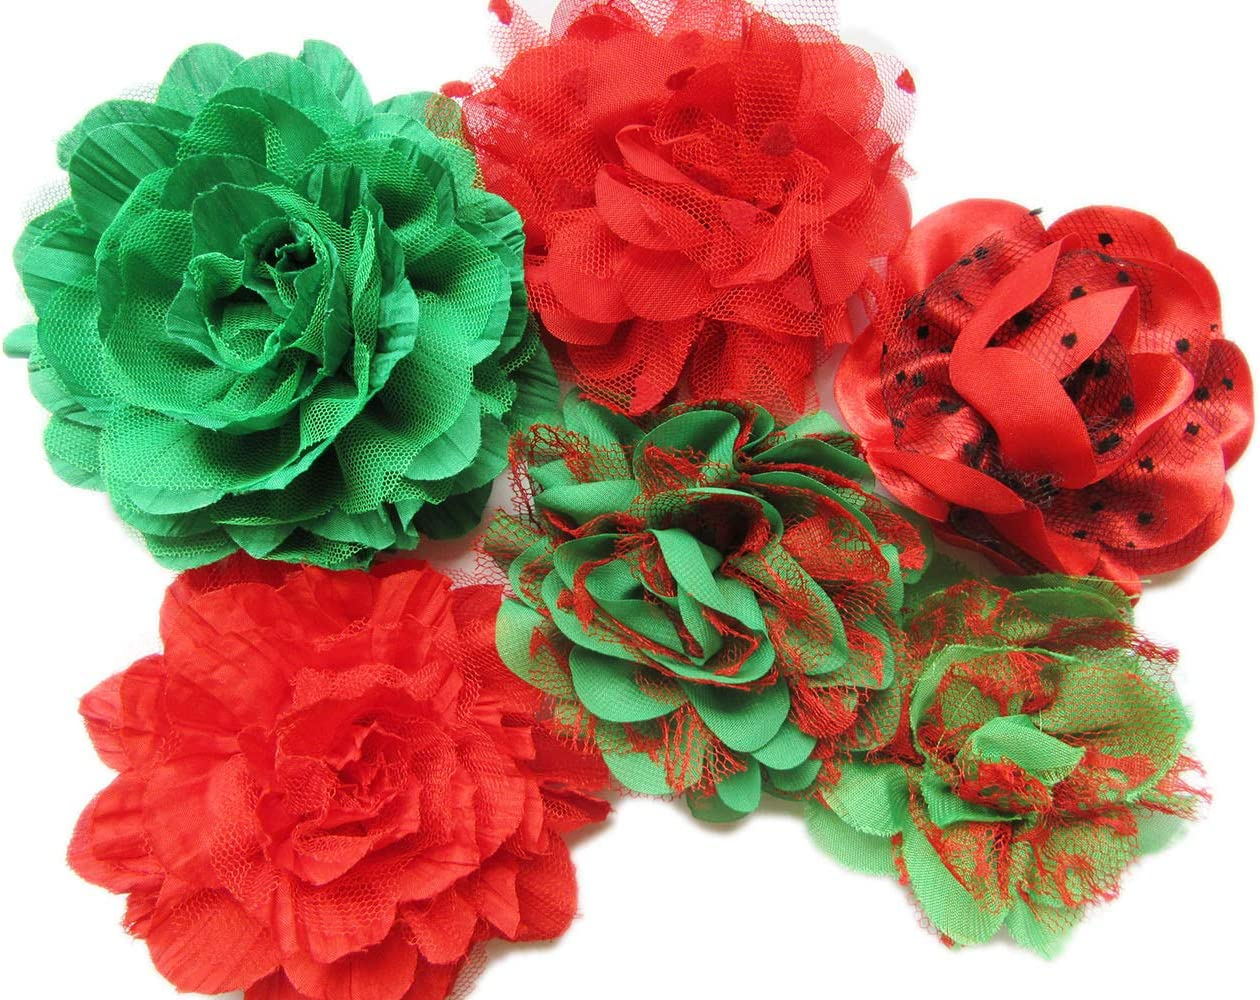 Fabric Flowers Decor Crafts Embellishments Bundle